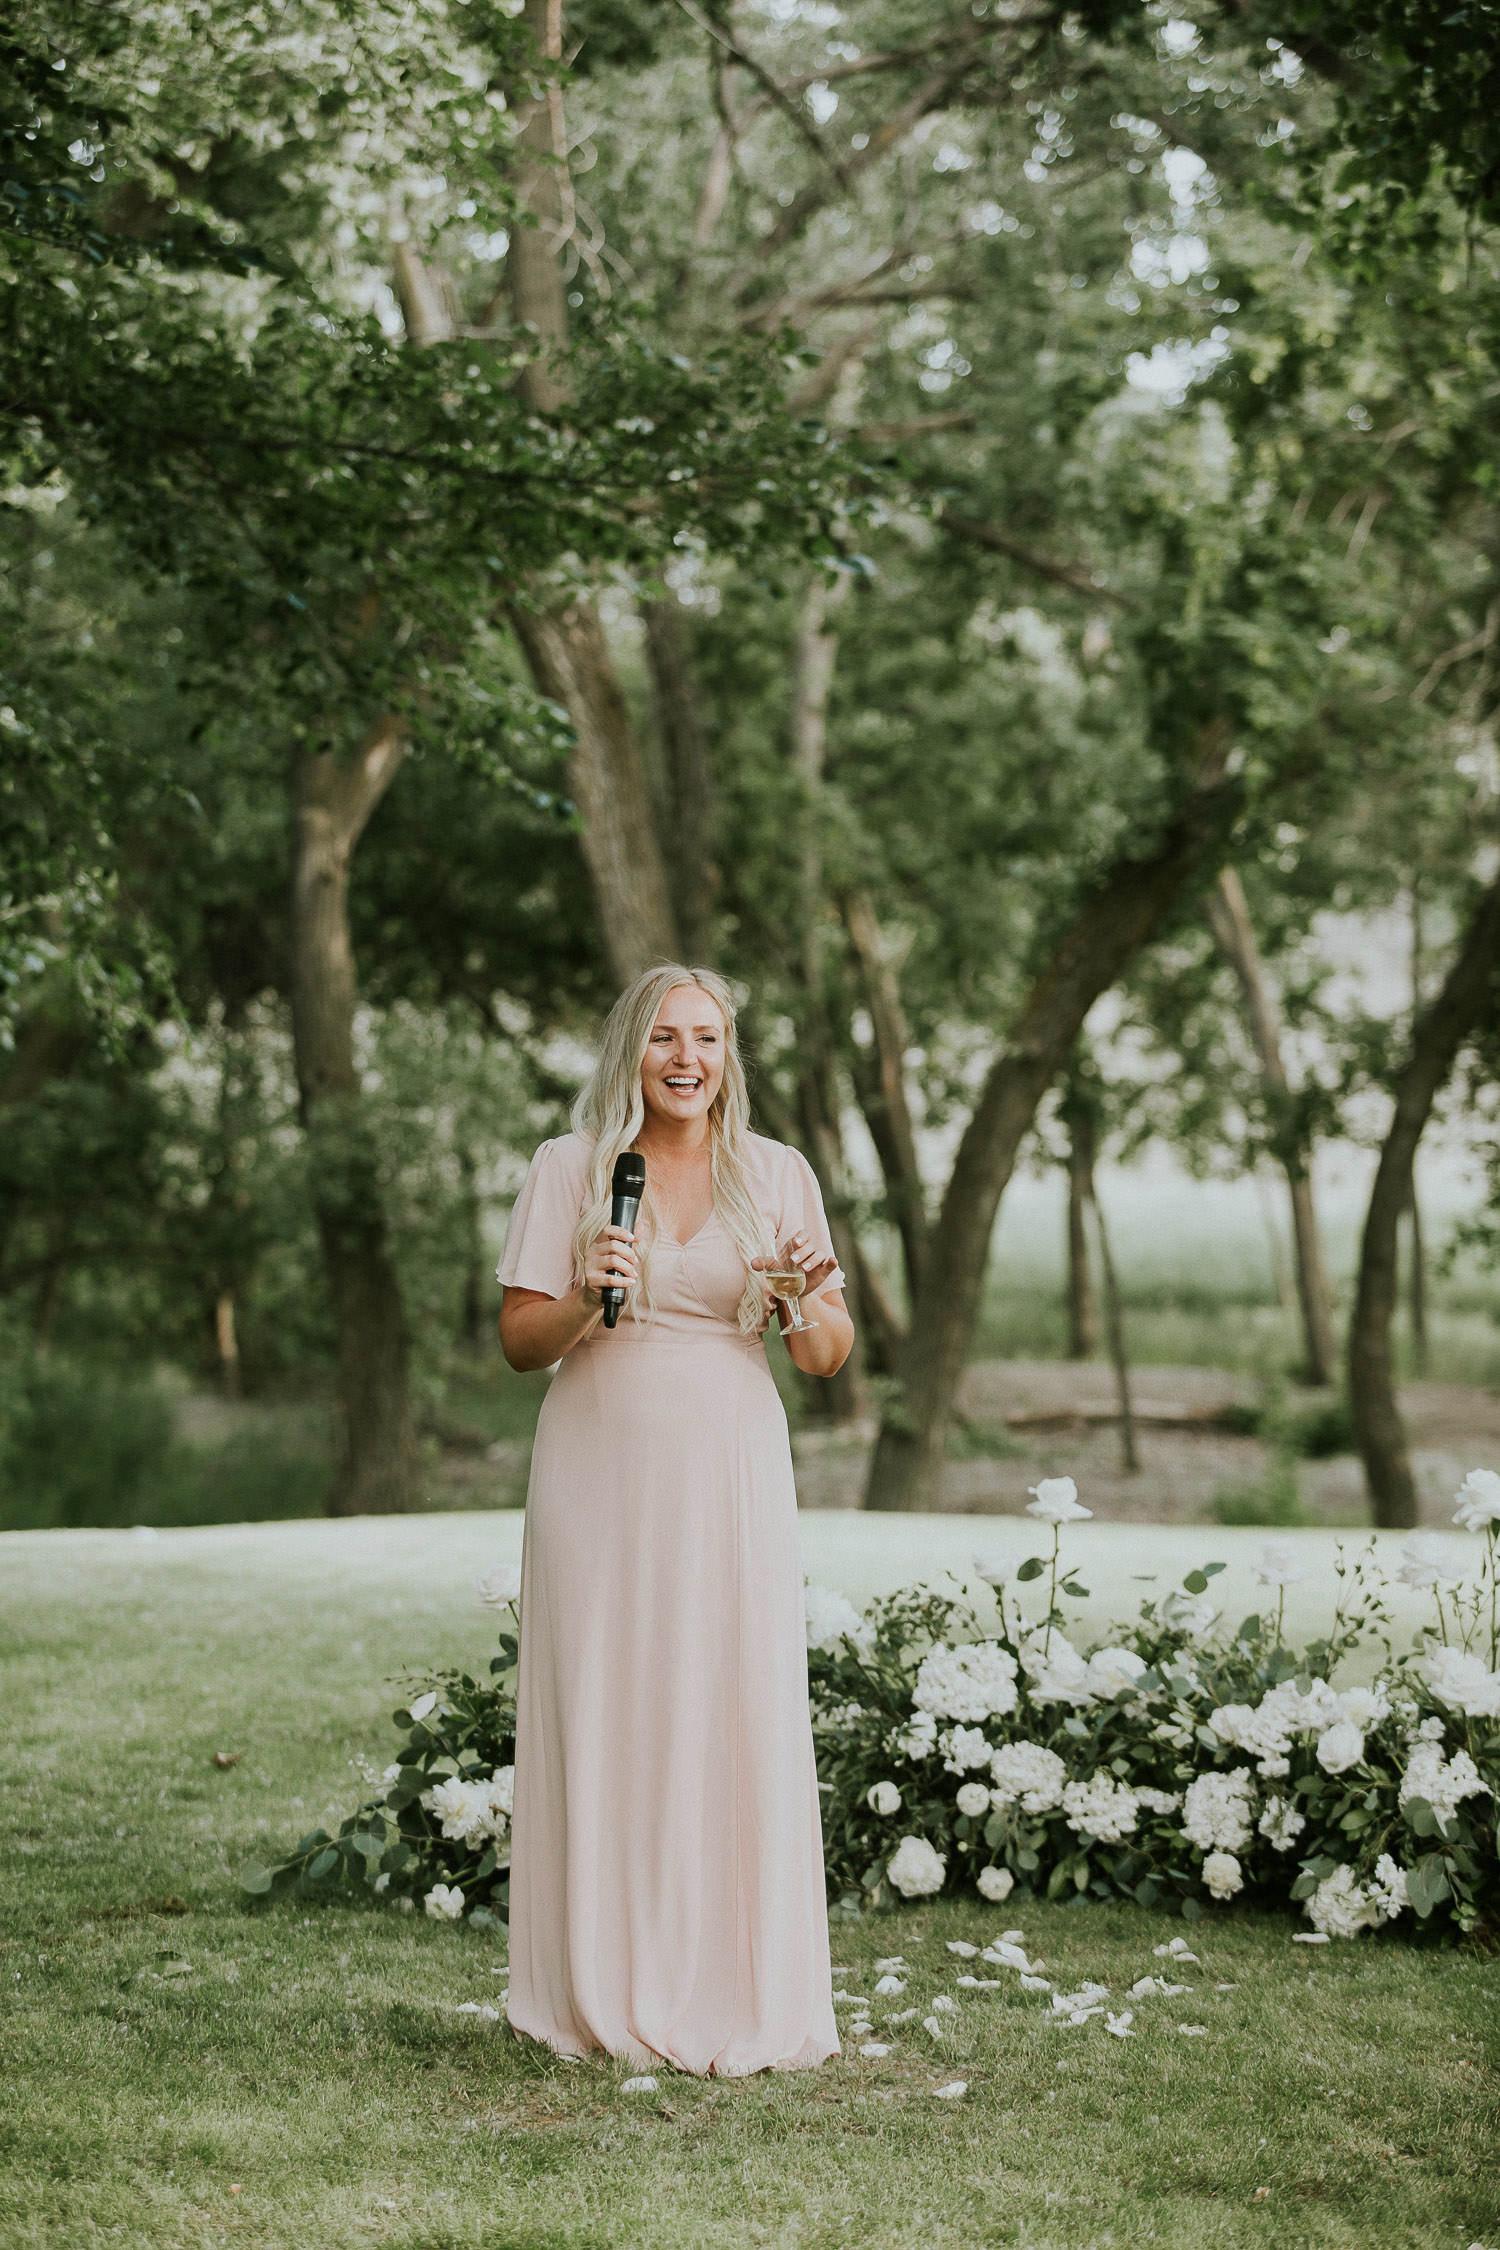 summer-backyard-wedding-in-alberta-sarah-pukin-0159